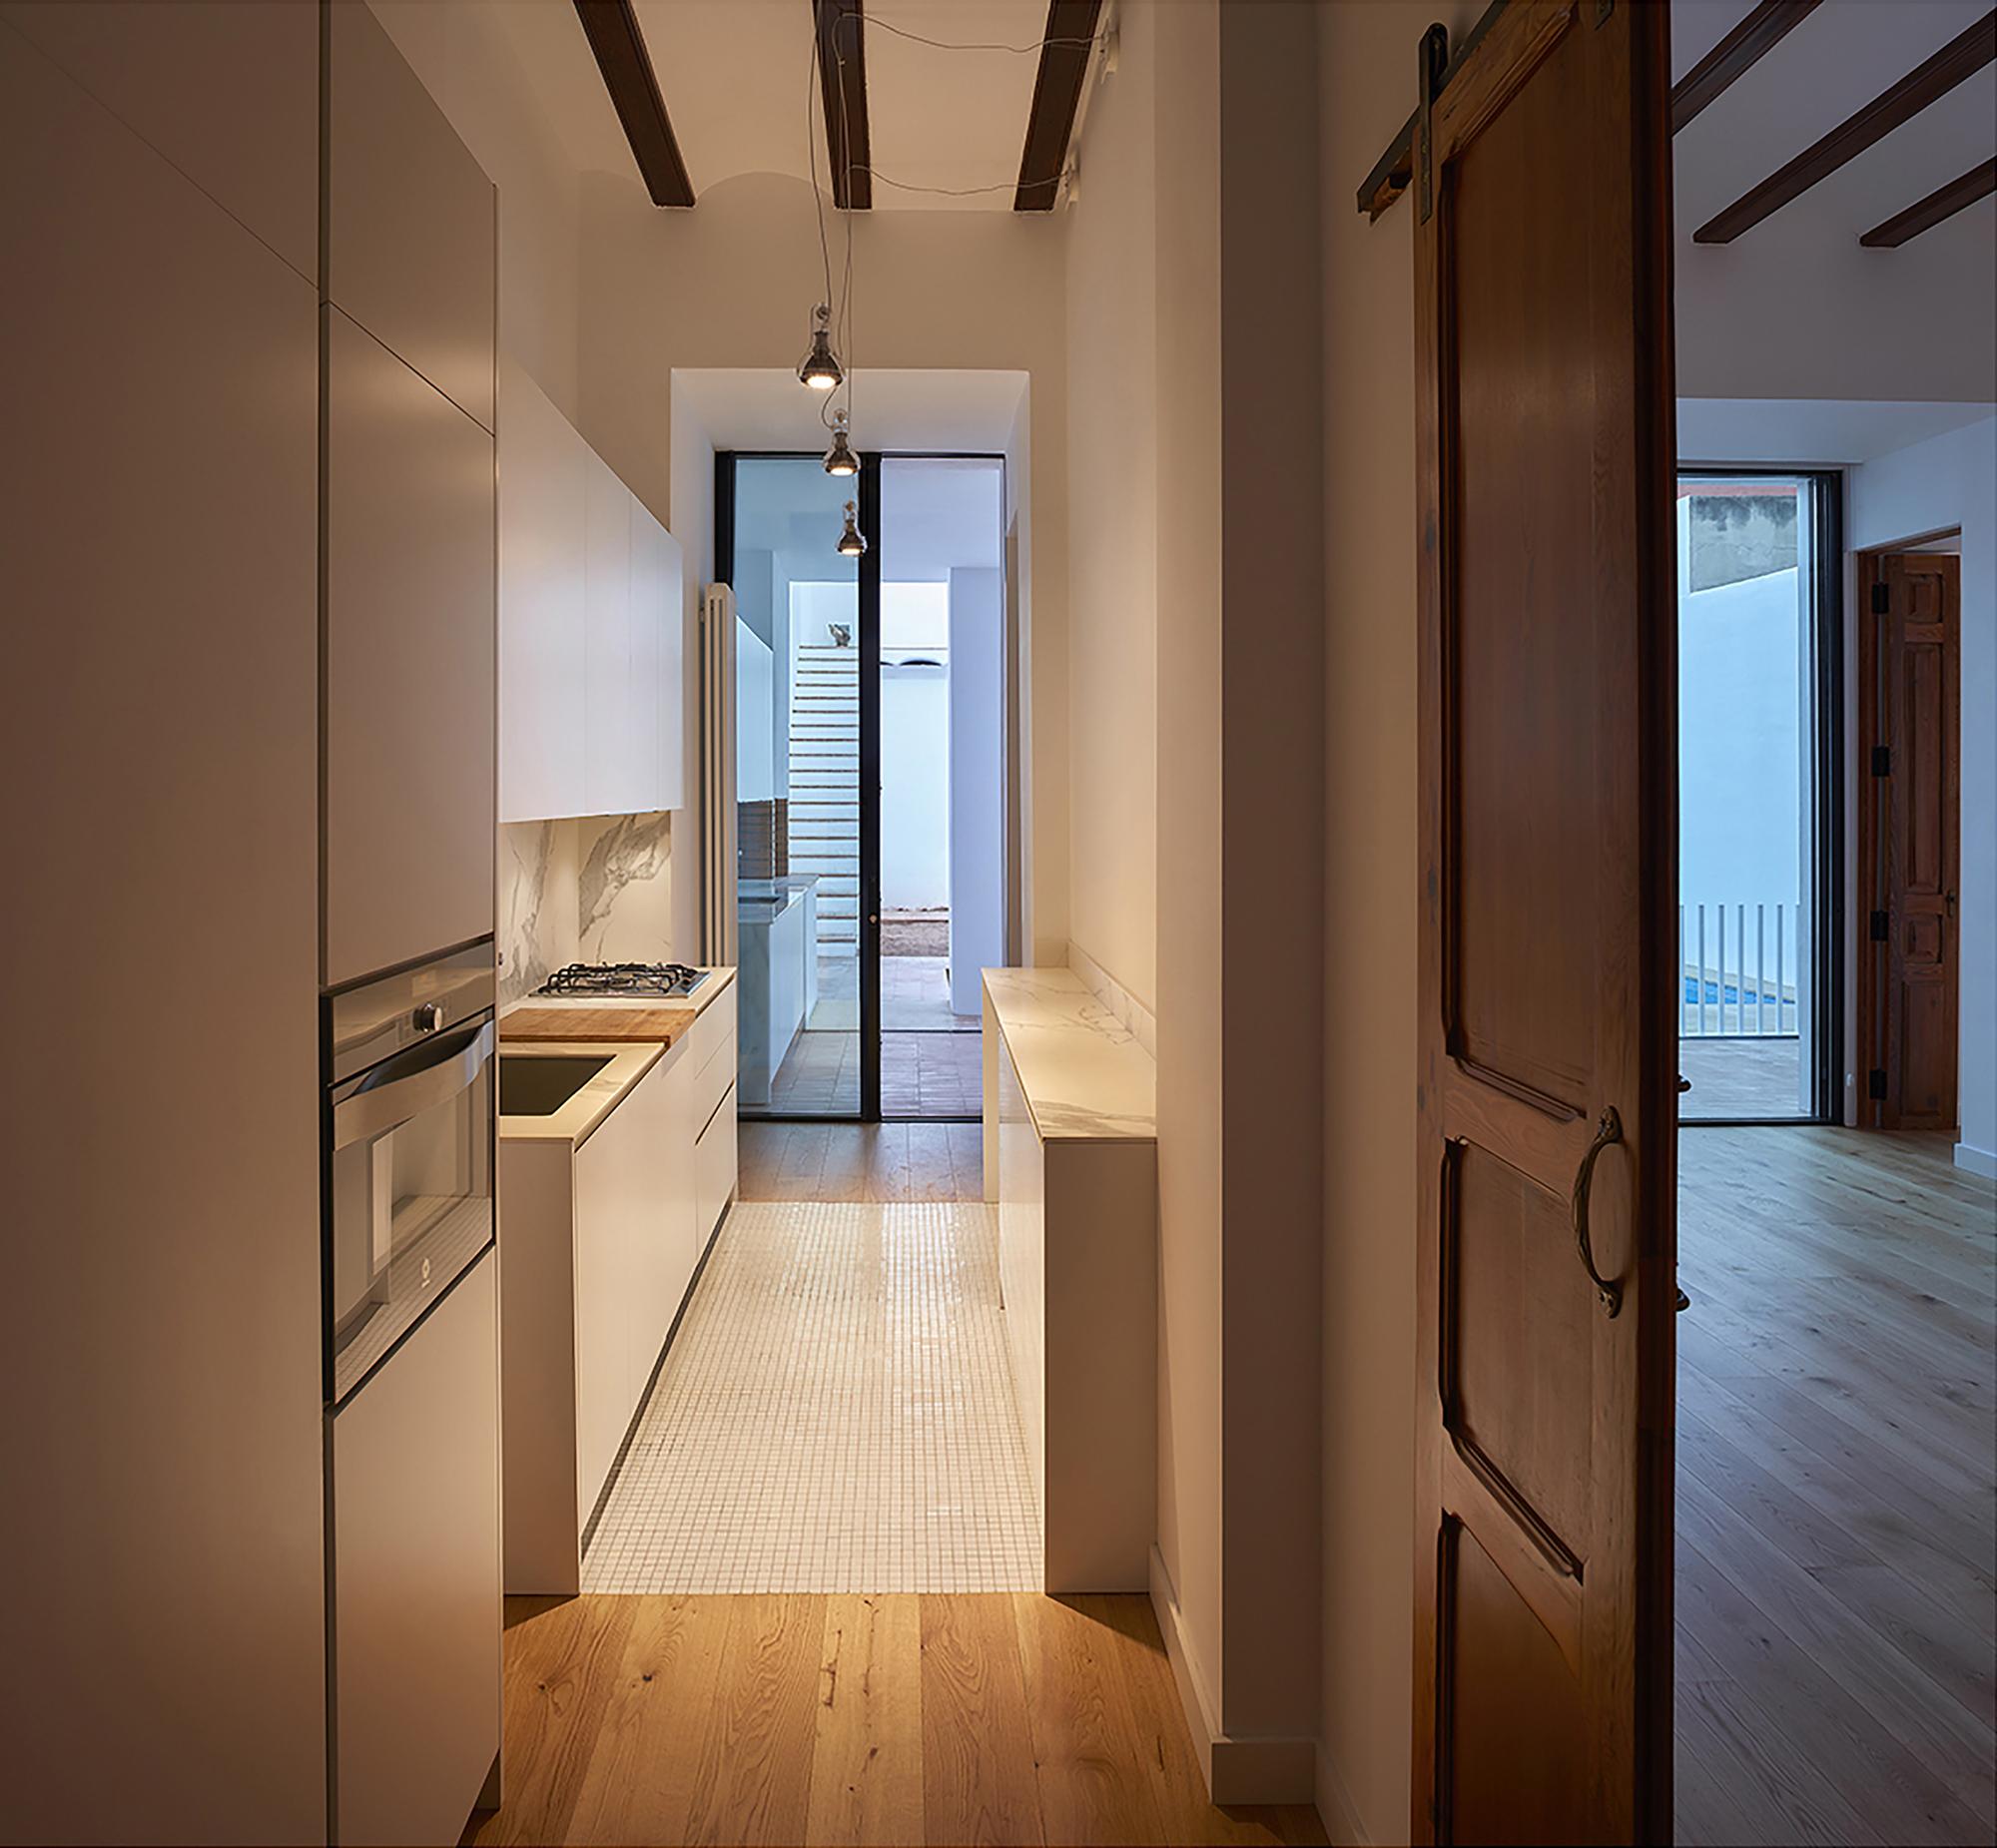 Galer a de rehabilitaci n vivienda en valencia dg for Arquitectos valencia